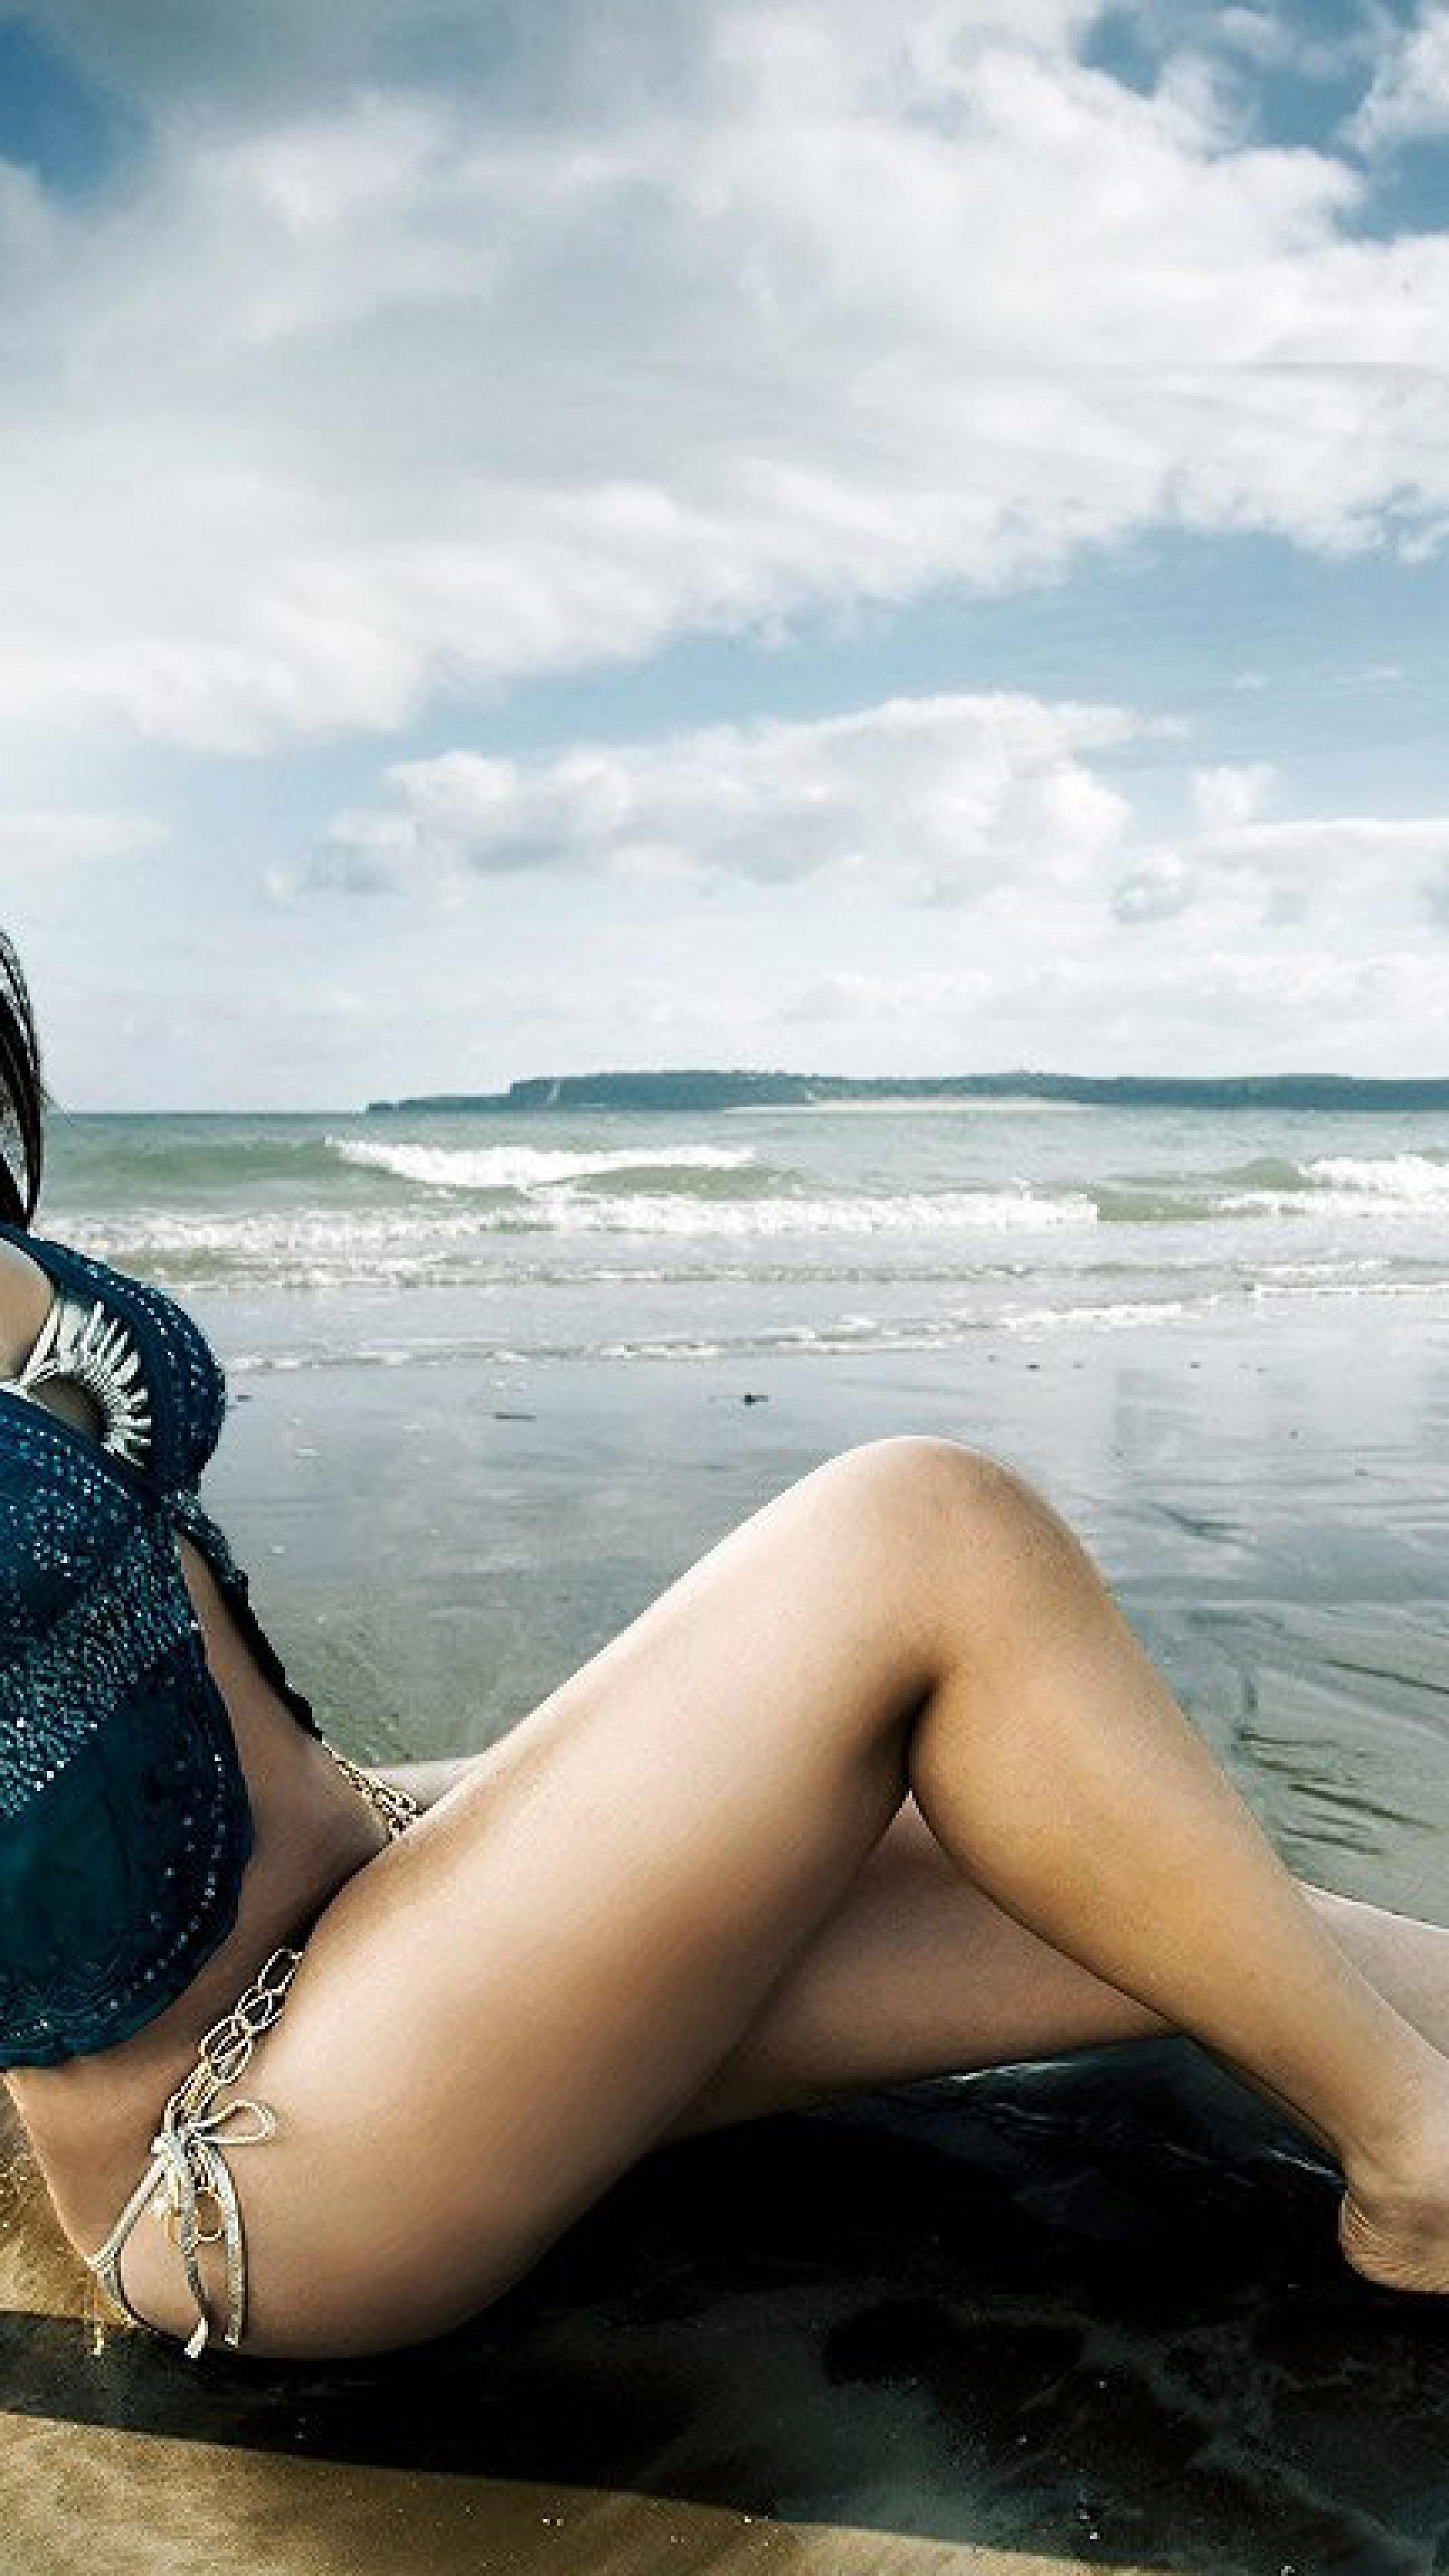 Neetu chandra latest bikini hdwallpapers hd wallpaper - Hd bikini wallpaper download ...